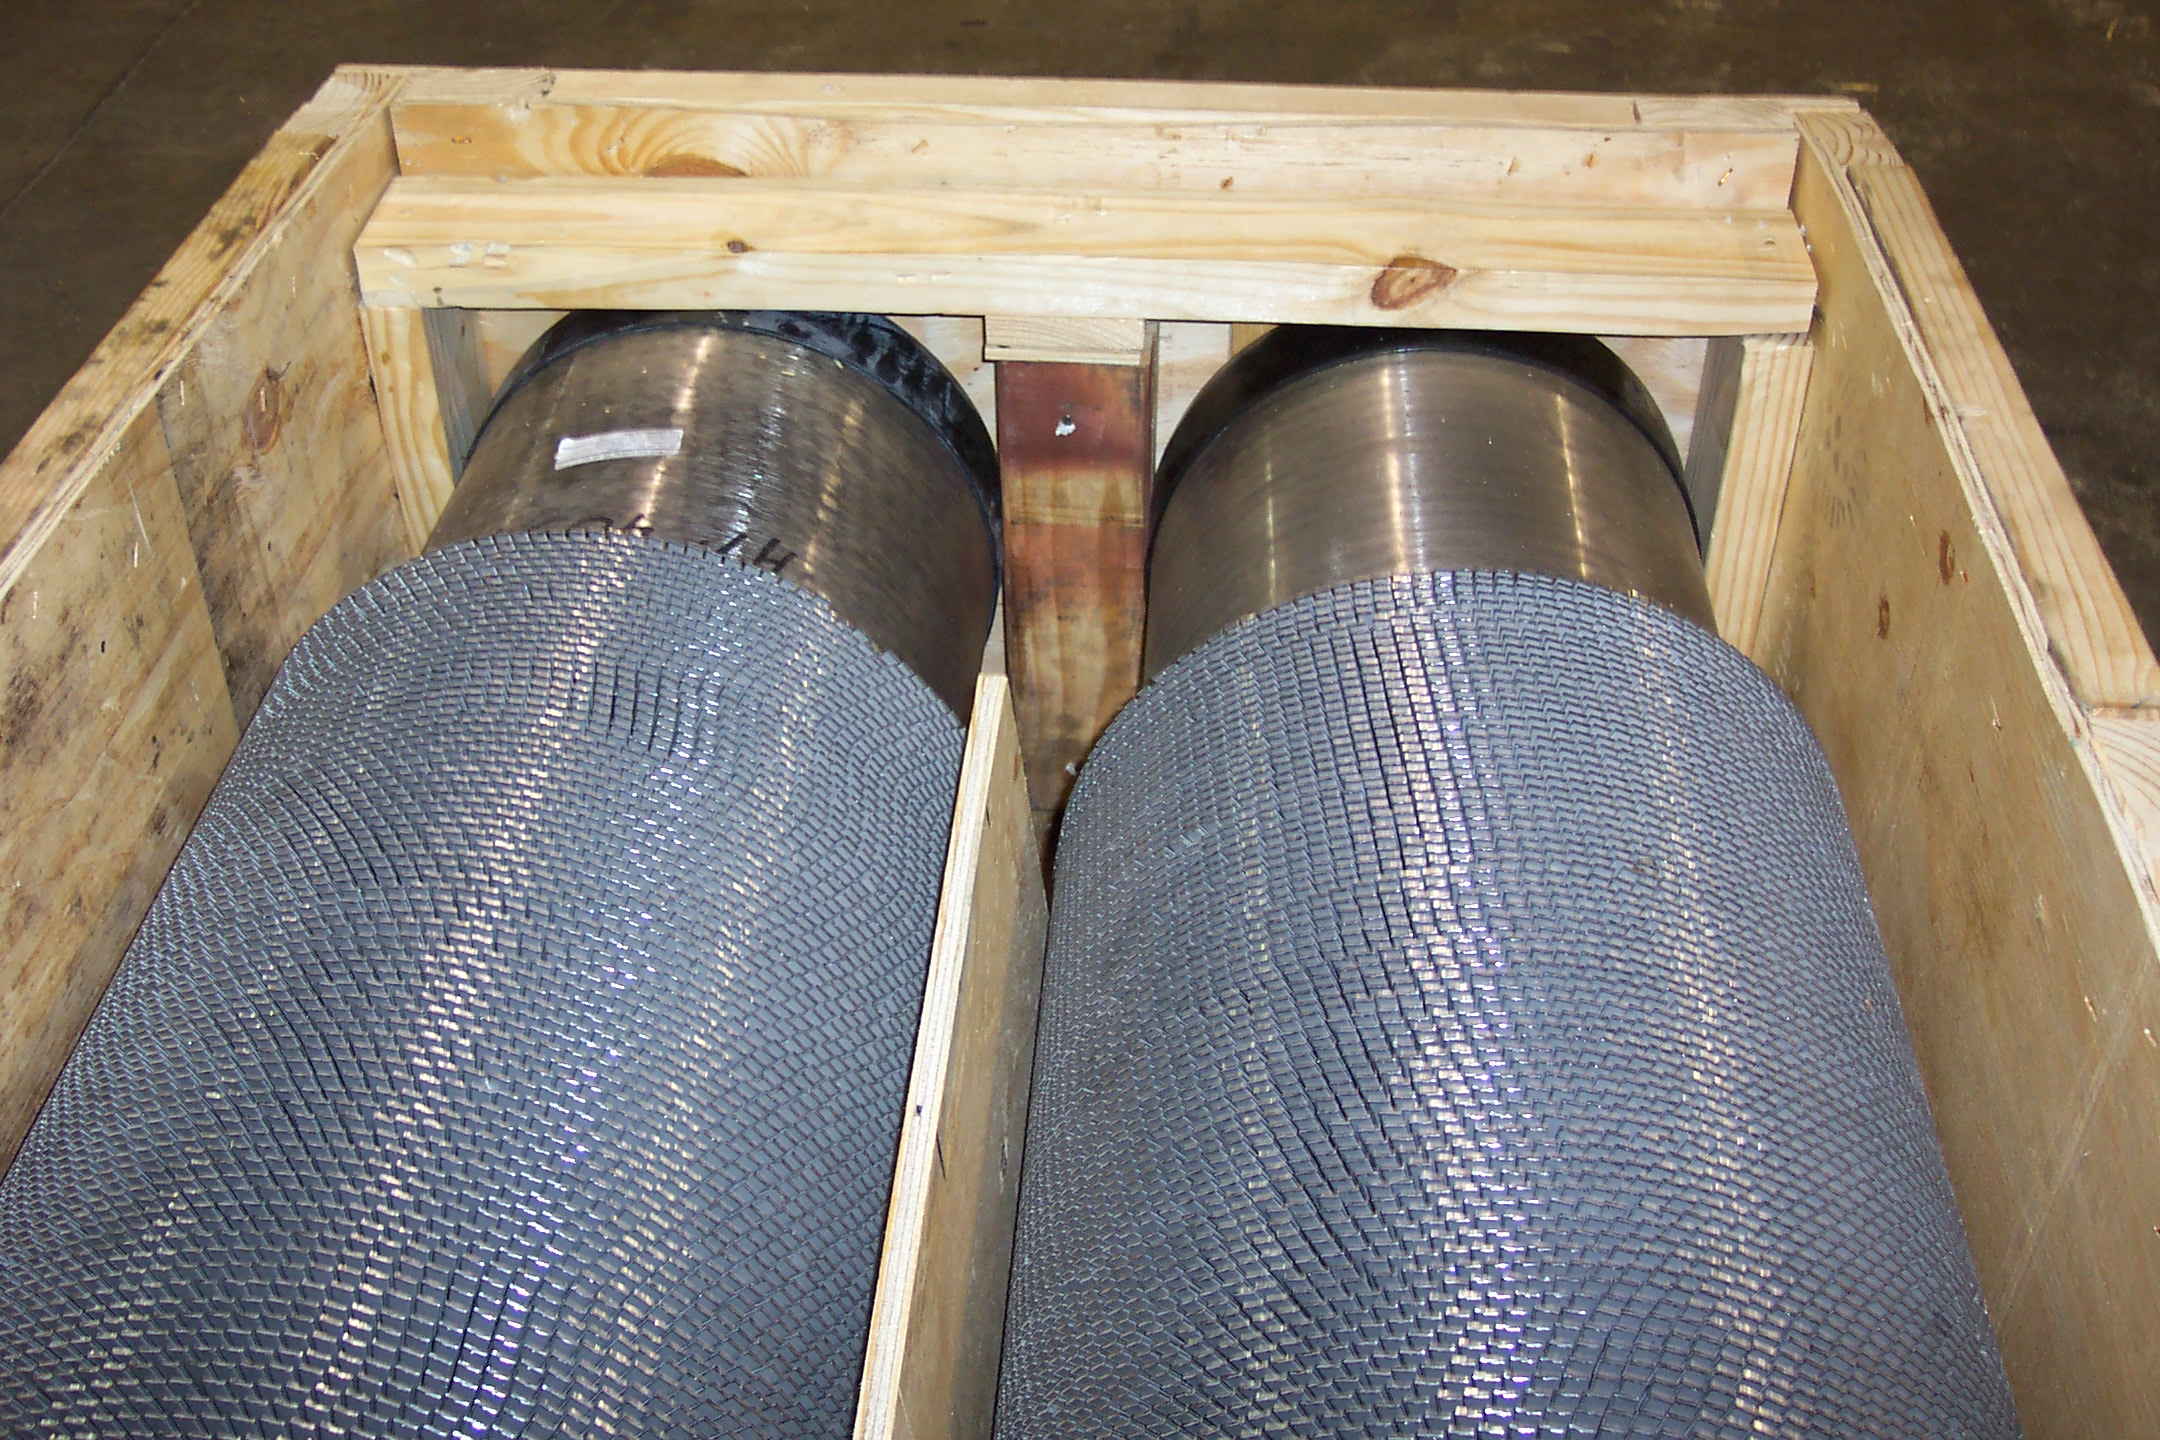 LA2192 - Shell, Procurement, Finned pipes (2006-11-09)